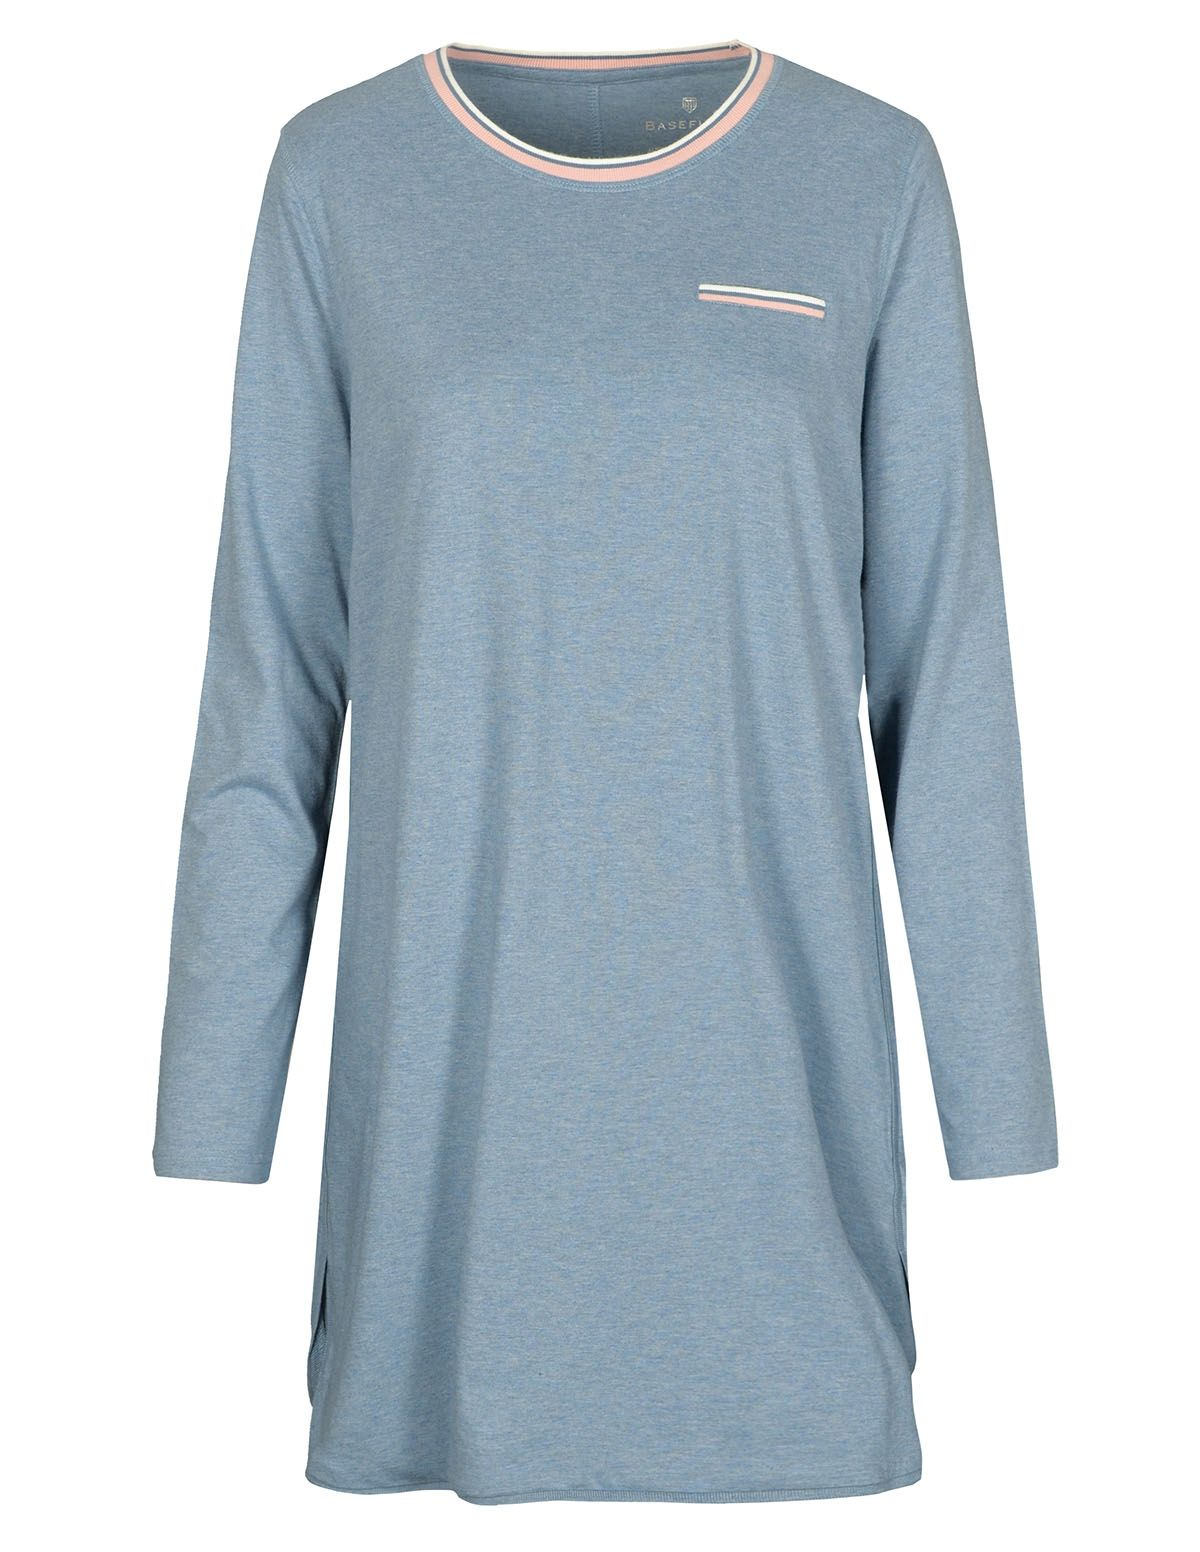 BASEFIELD HOMEWEAR Nachthemd - Blau Melange